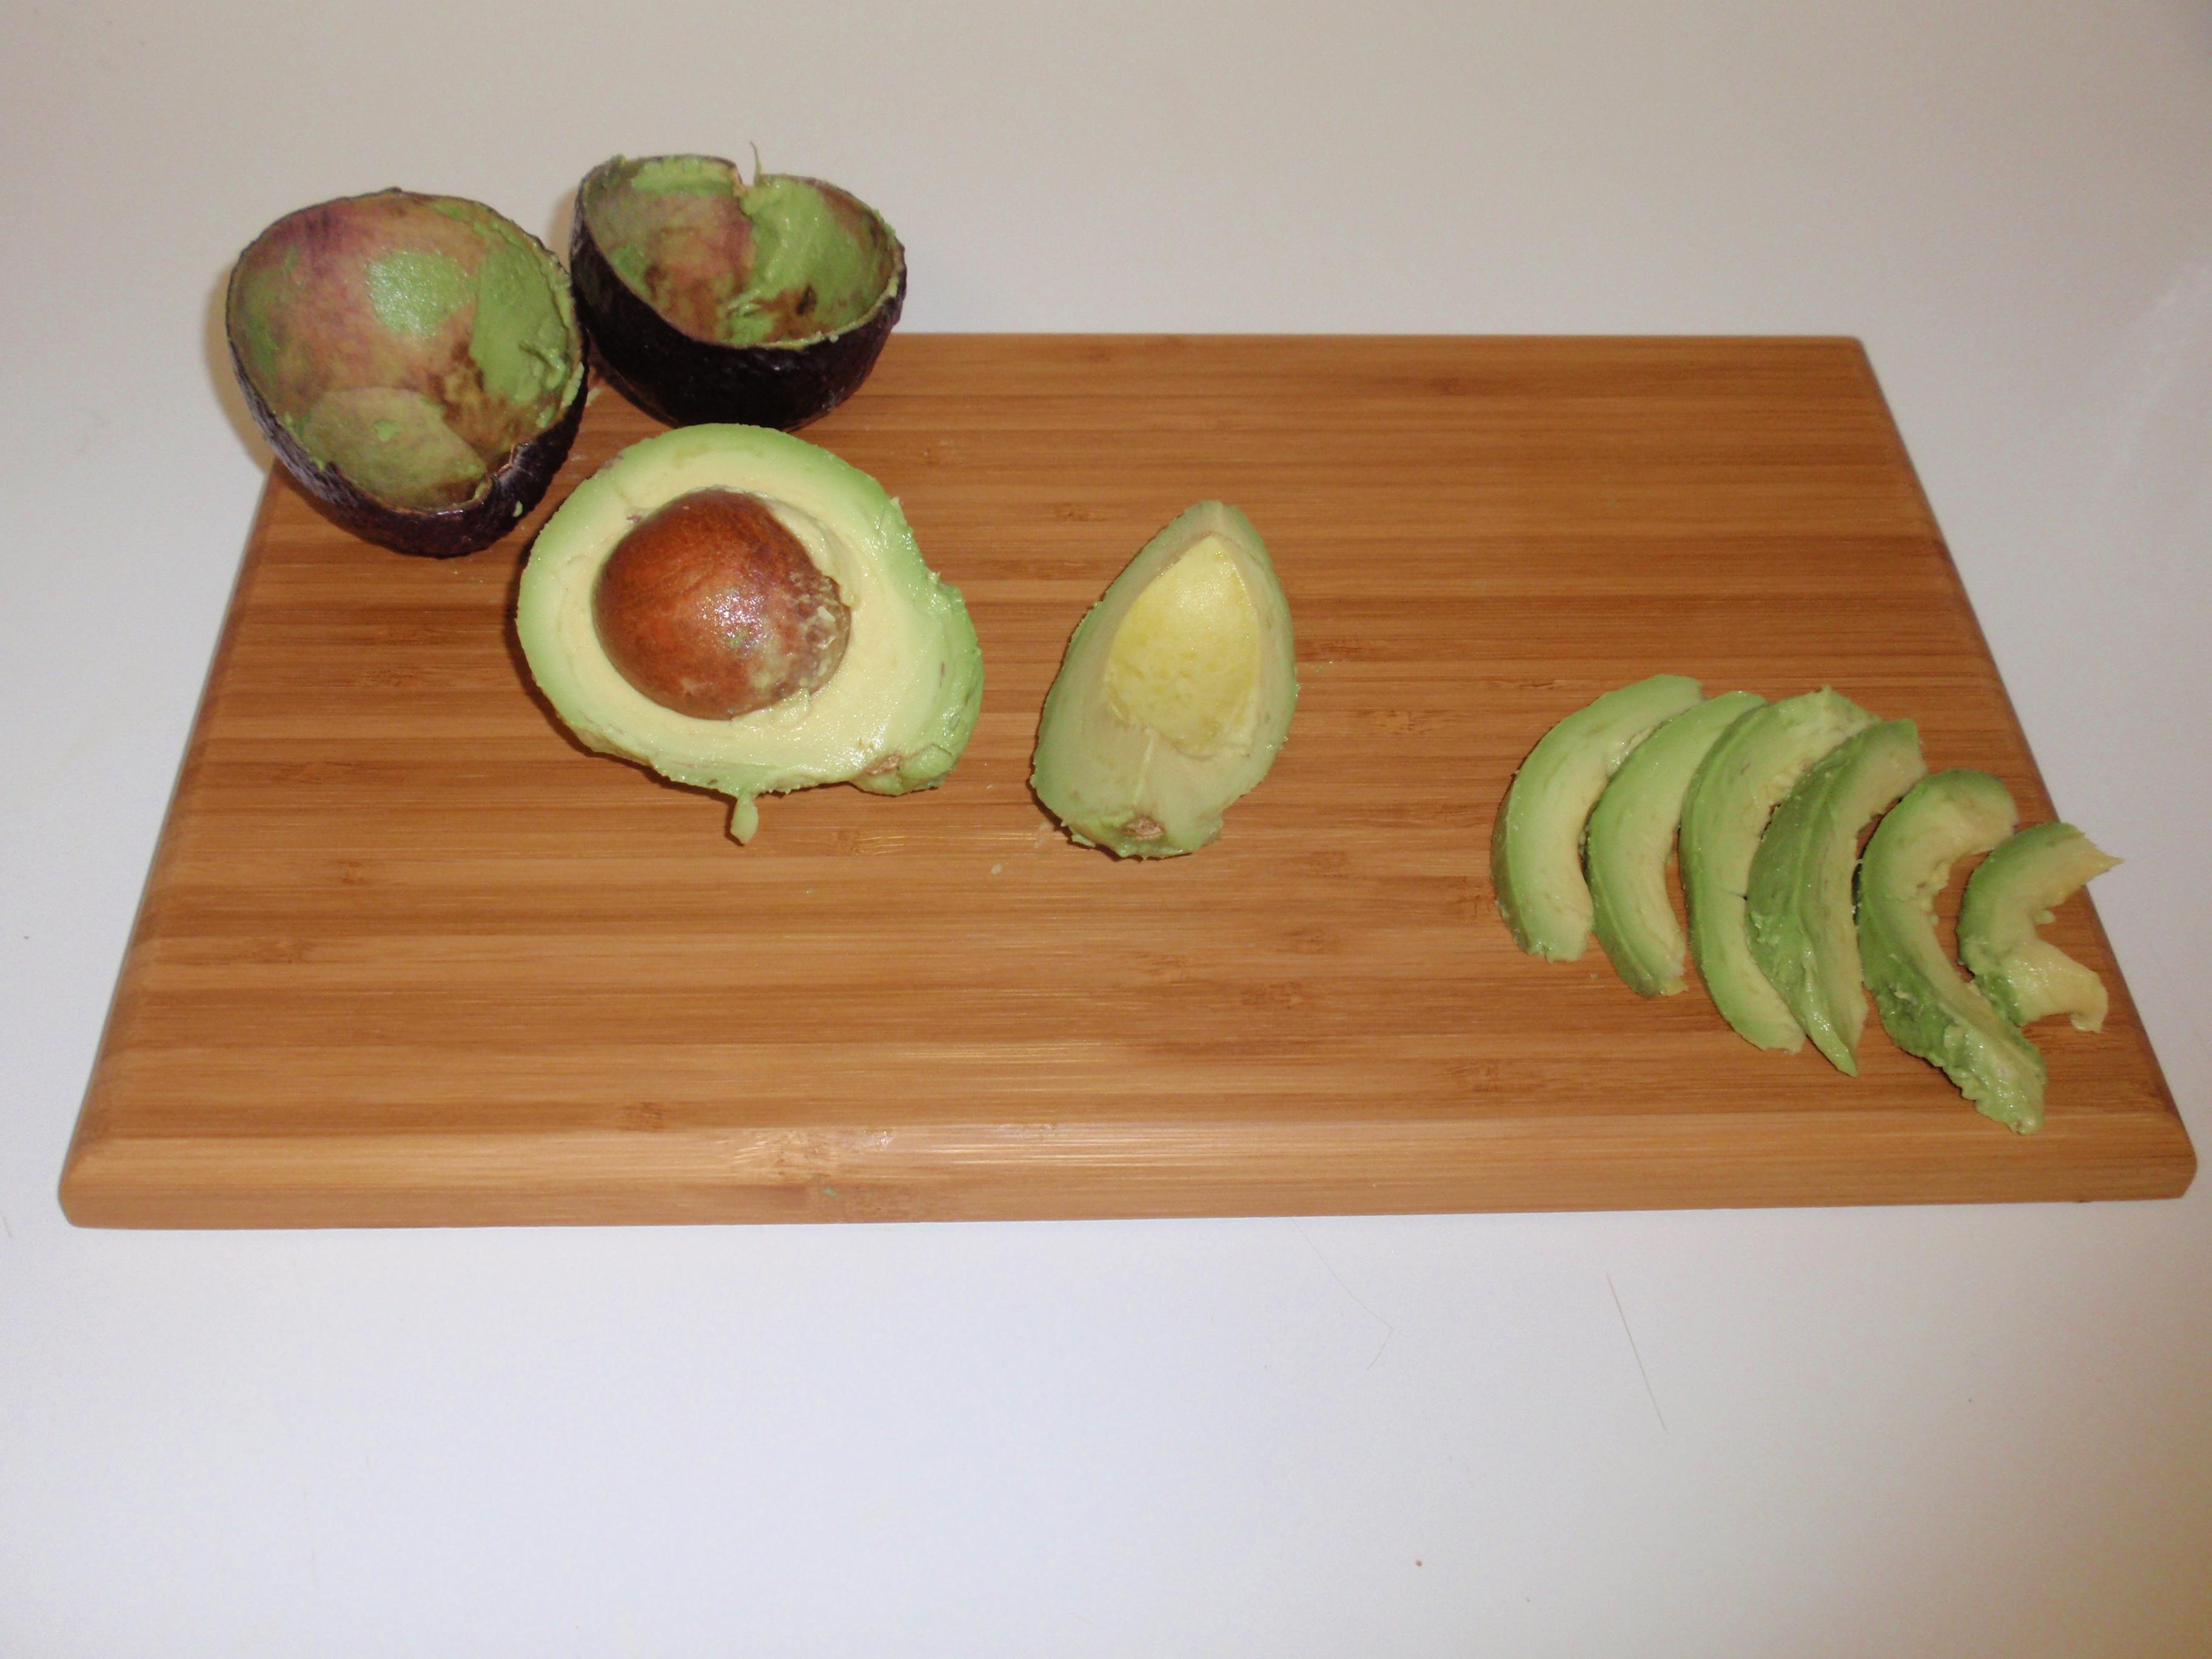 Picture of Preparing the Avocado